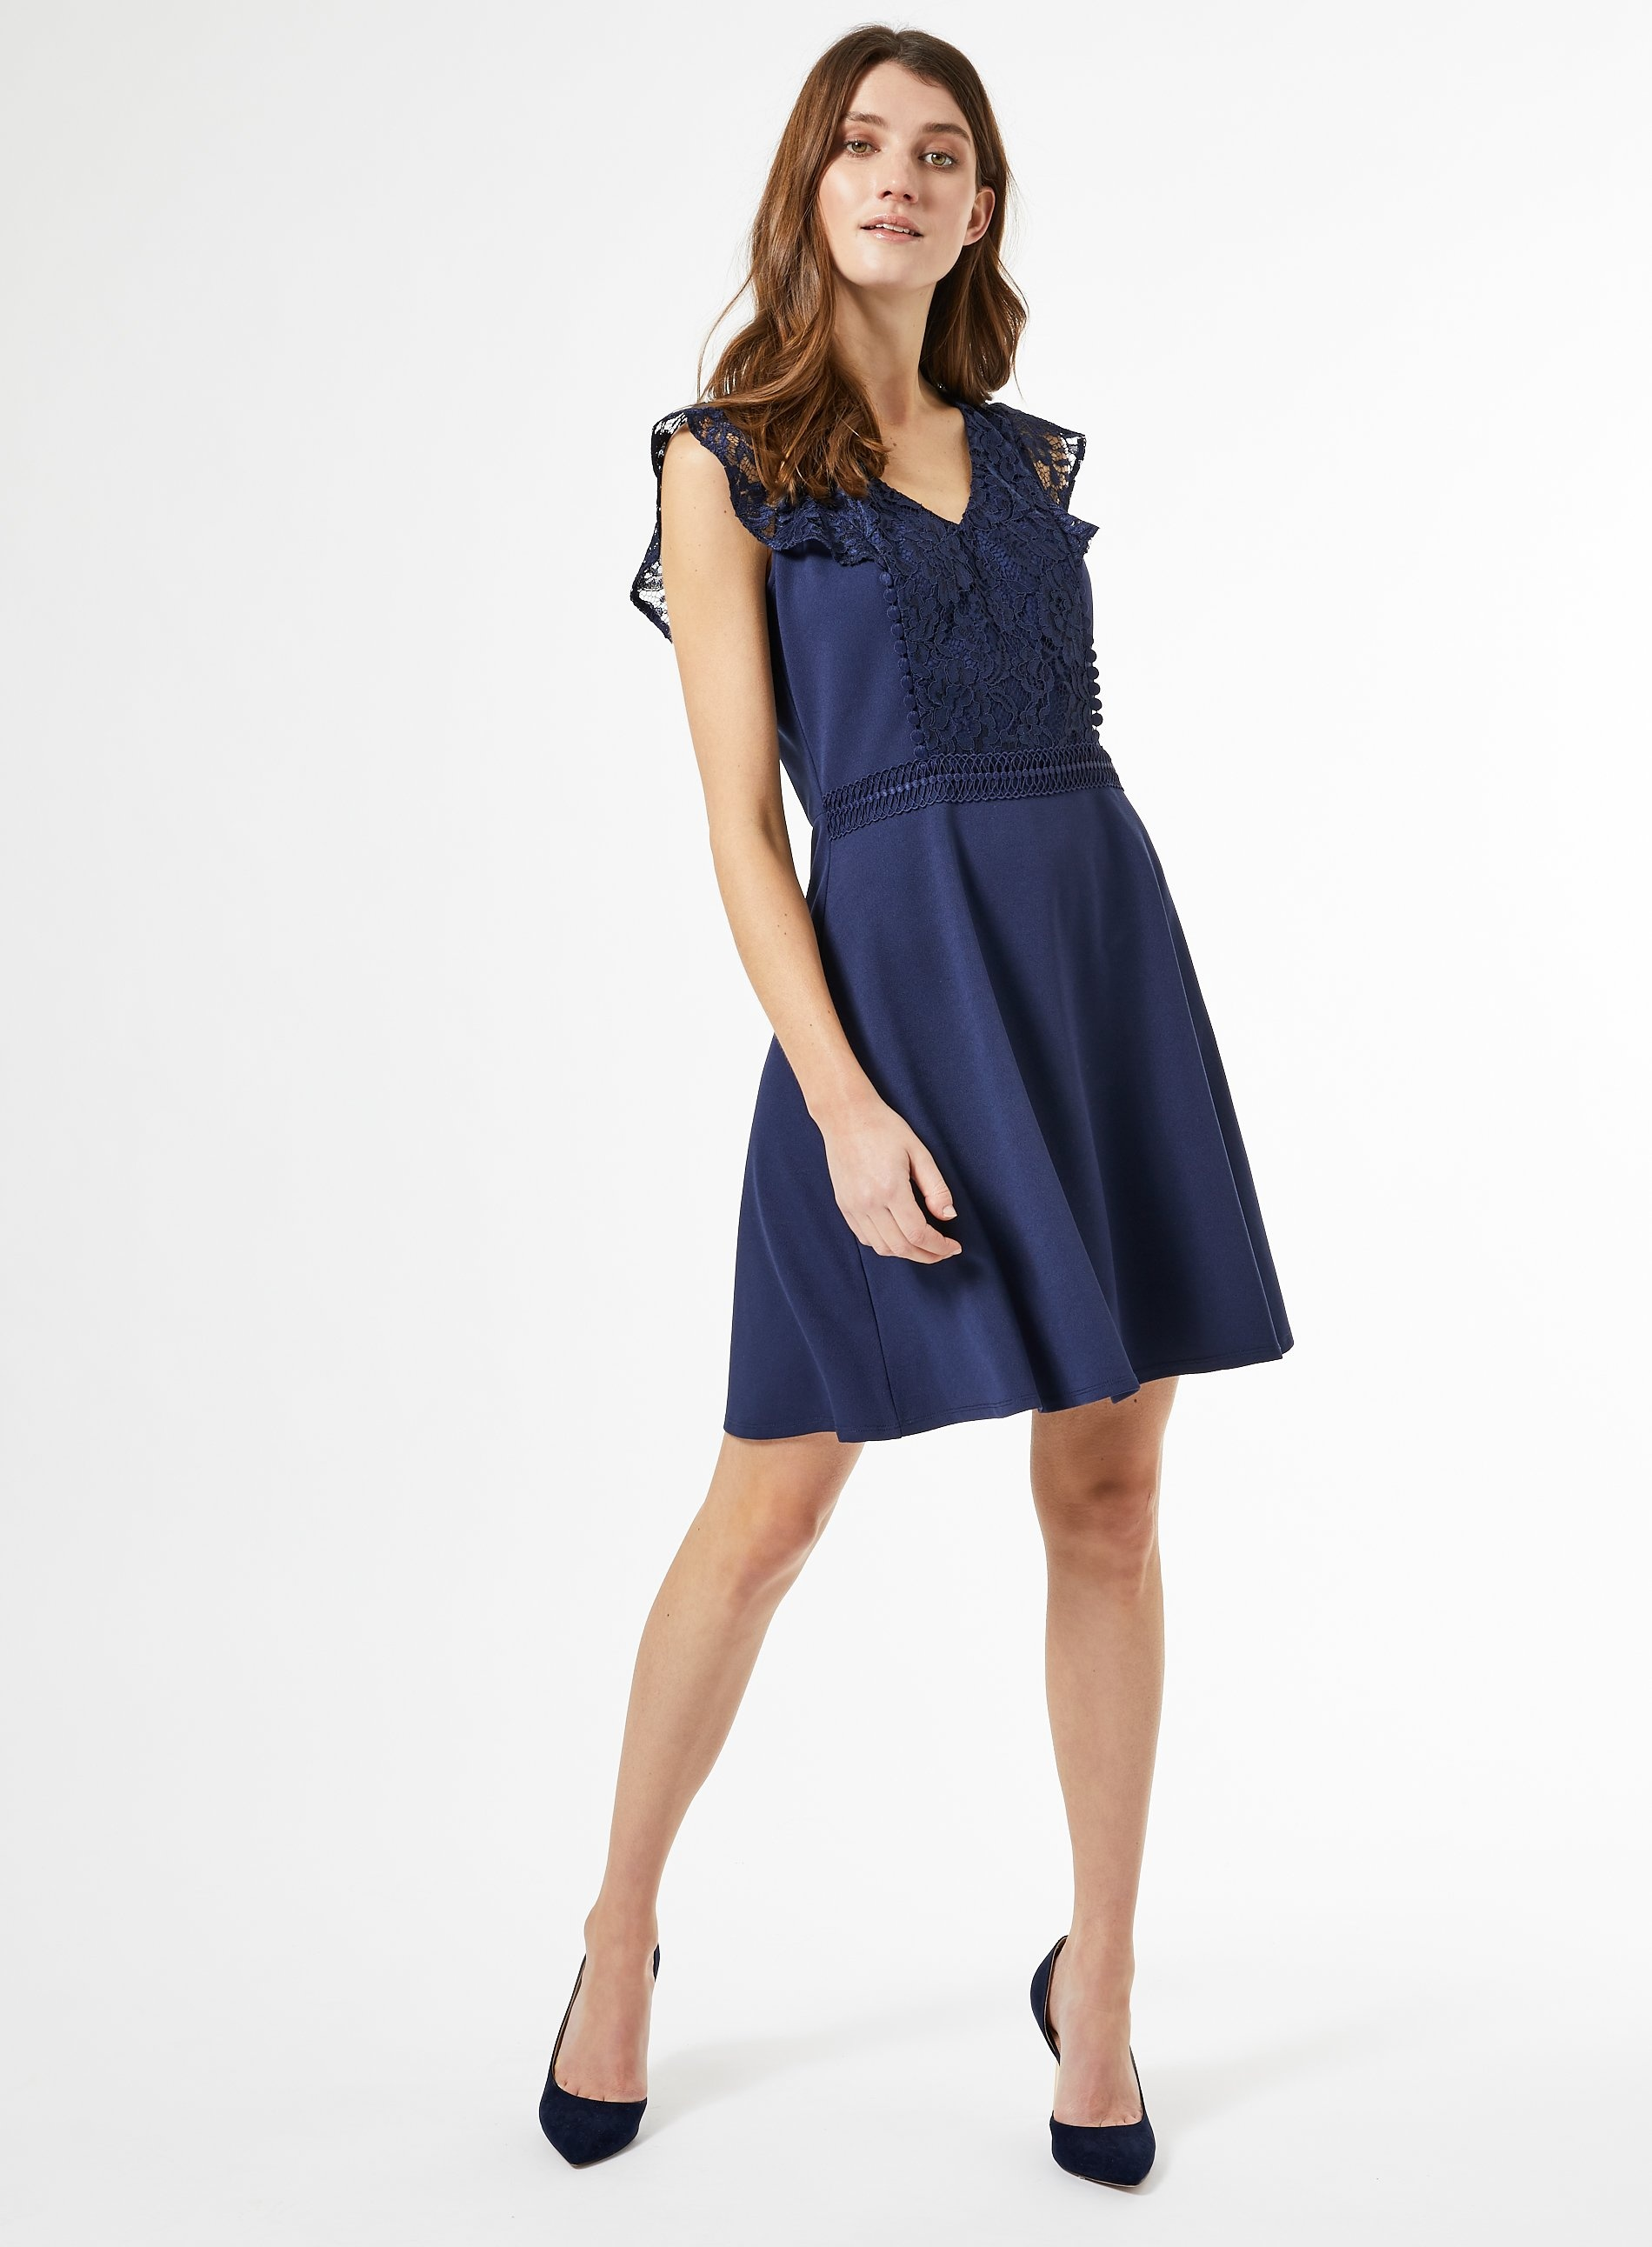 Dorothy Perkins Billie & Blossom Petite Cobalt Lace Dress